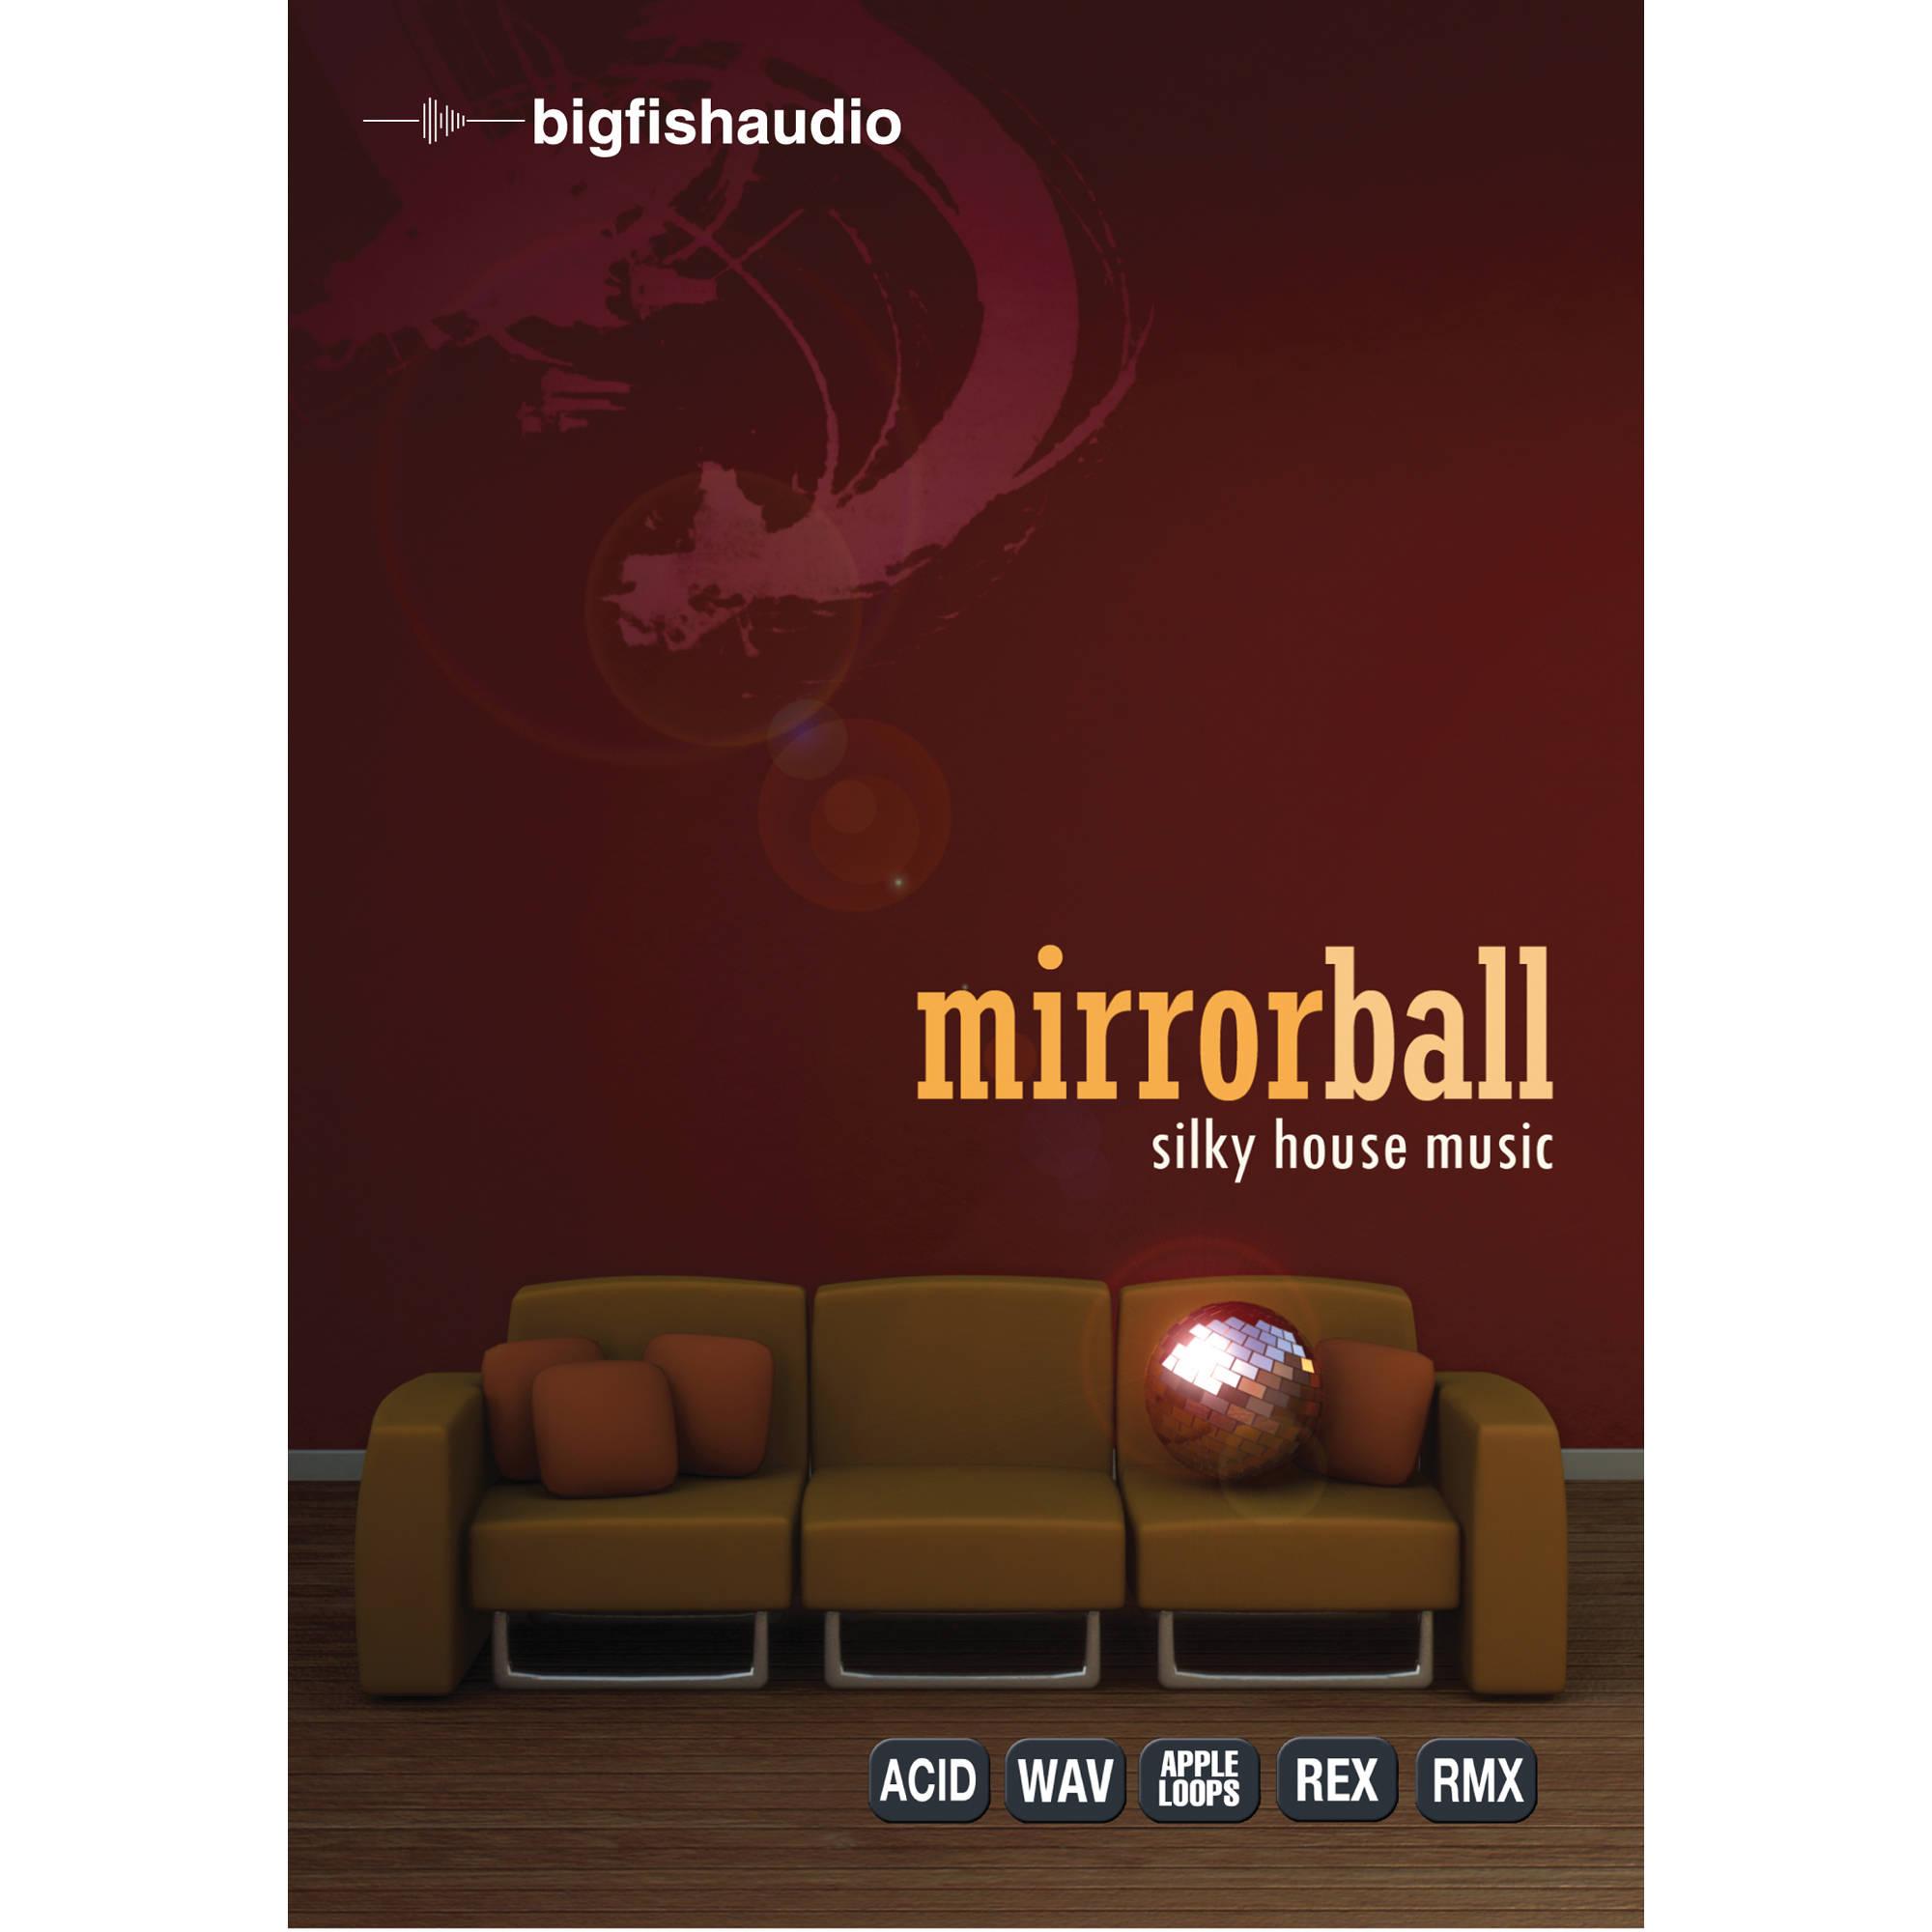 Big fish audio mirrorball silky house music dvd mbsh1 for Big fish audio